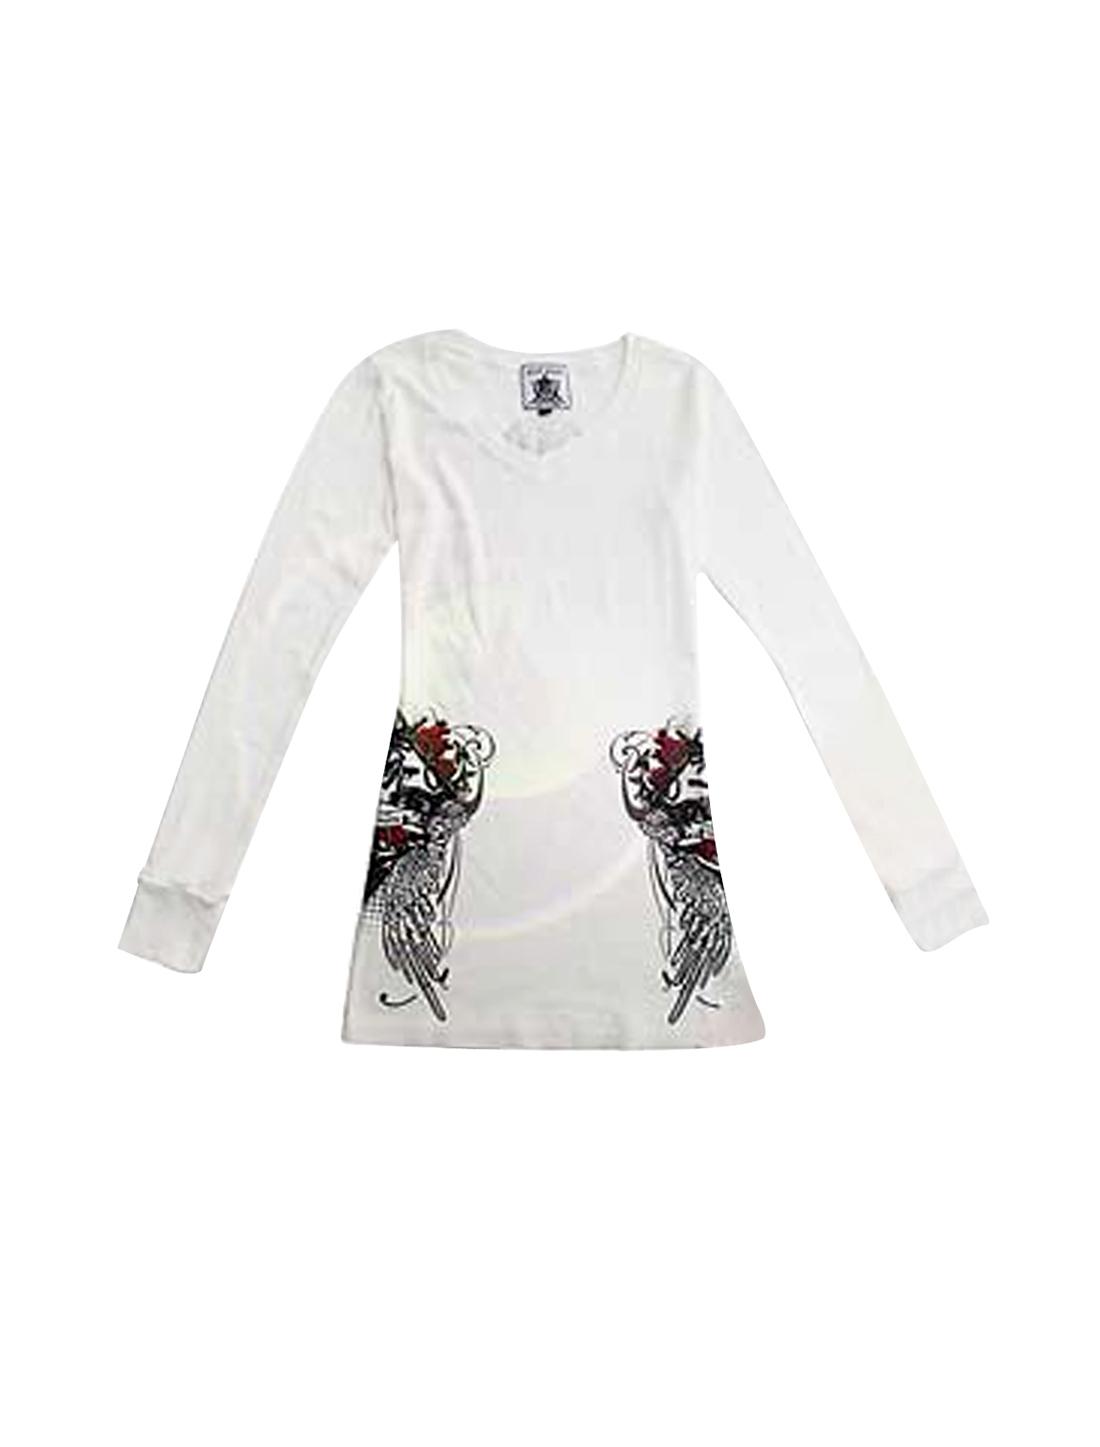 Woman V Neck Rhinestud Anchor Print Long Sleeve Shirt Top White XS